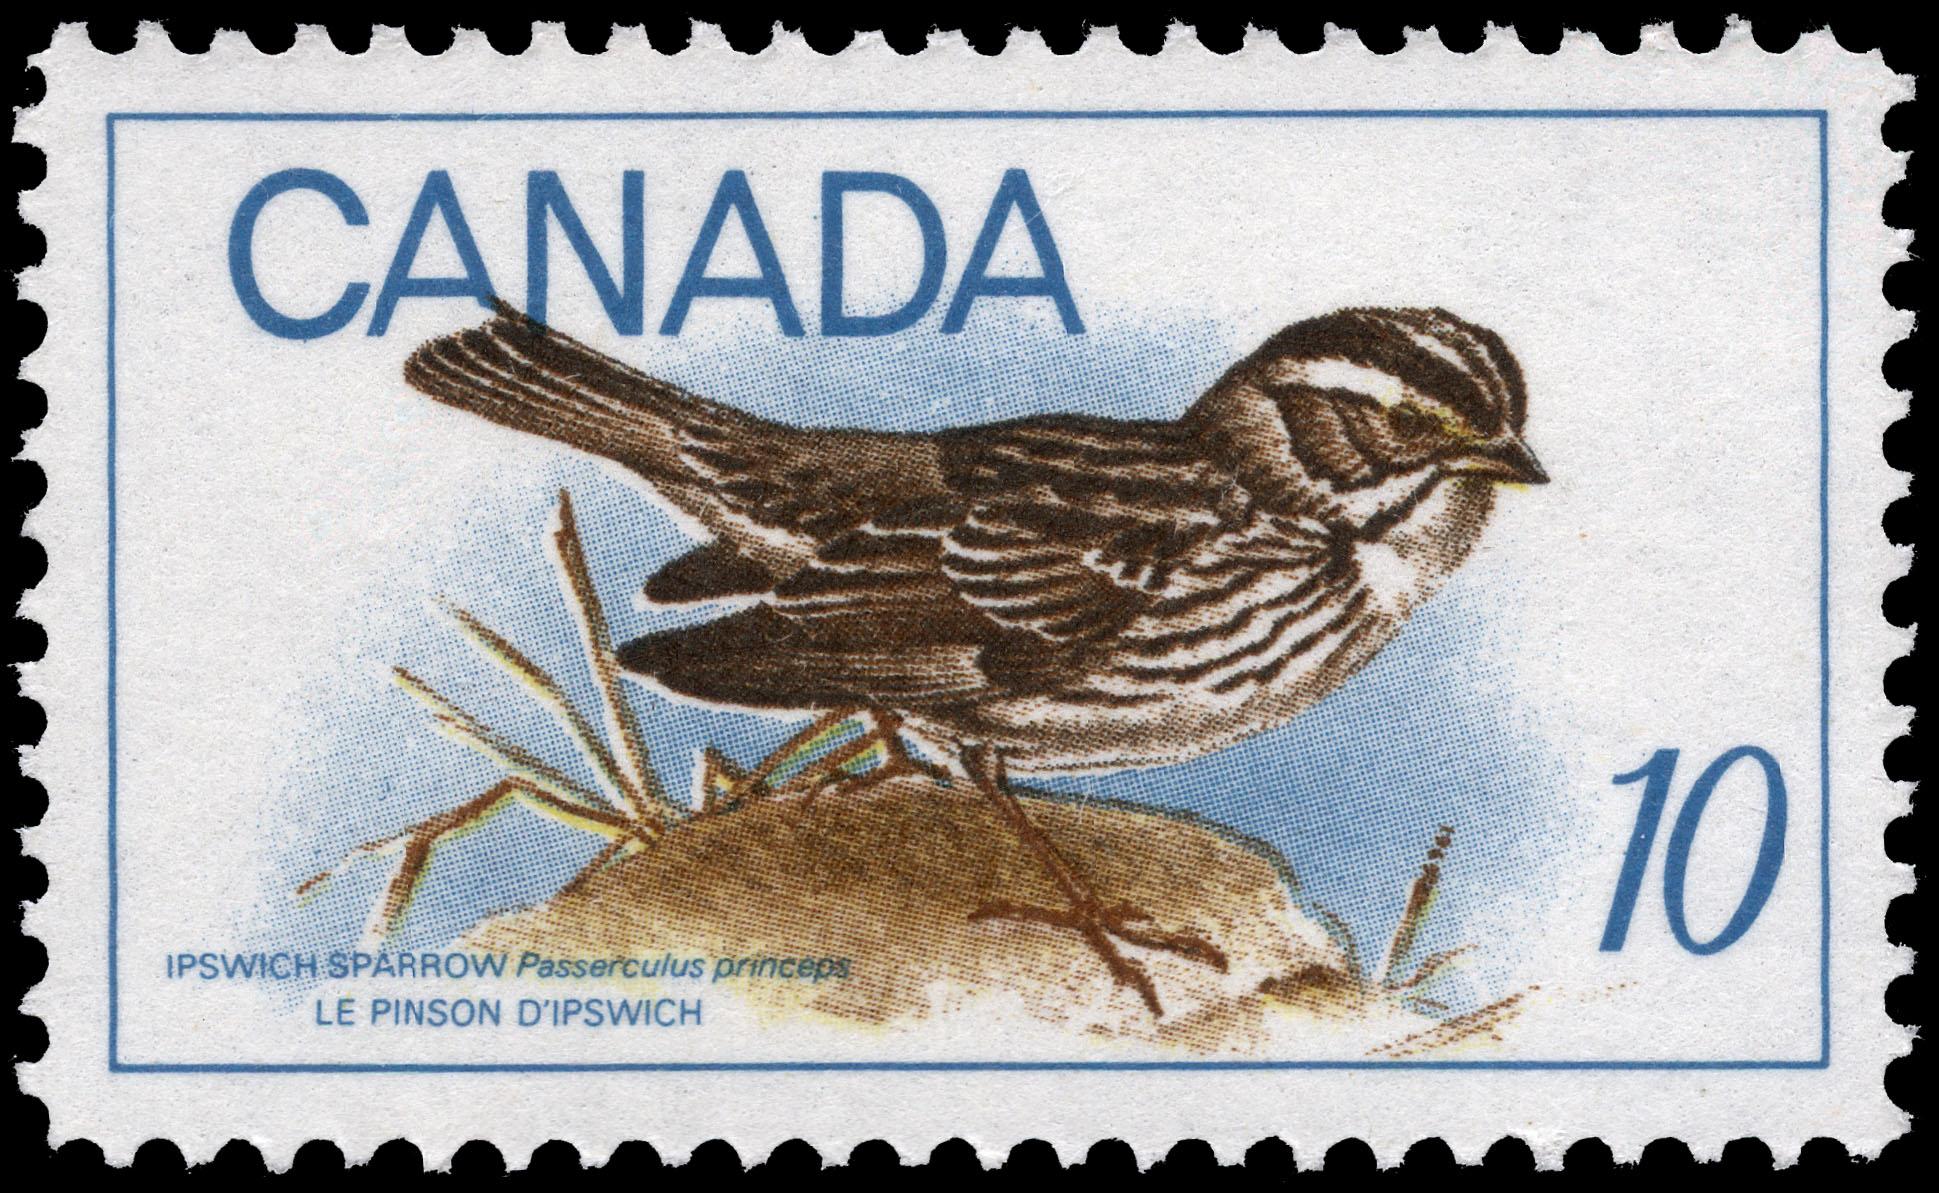 Ipswich Sparrow, Passerculus princeps Canada Postage Stamp